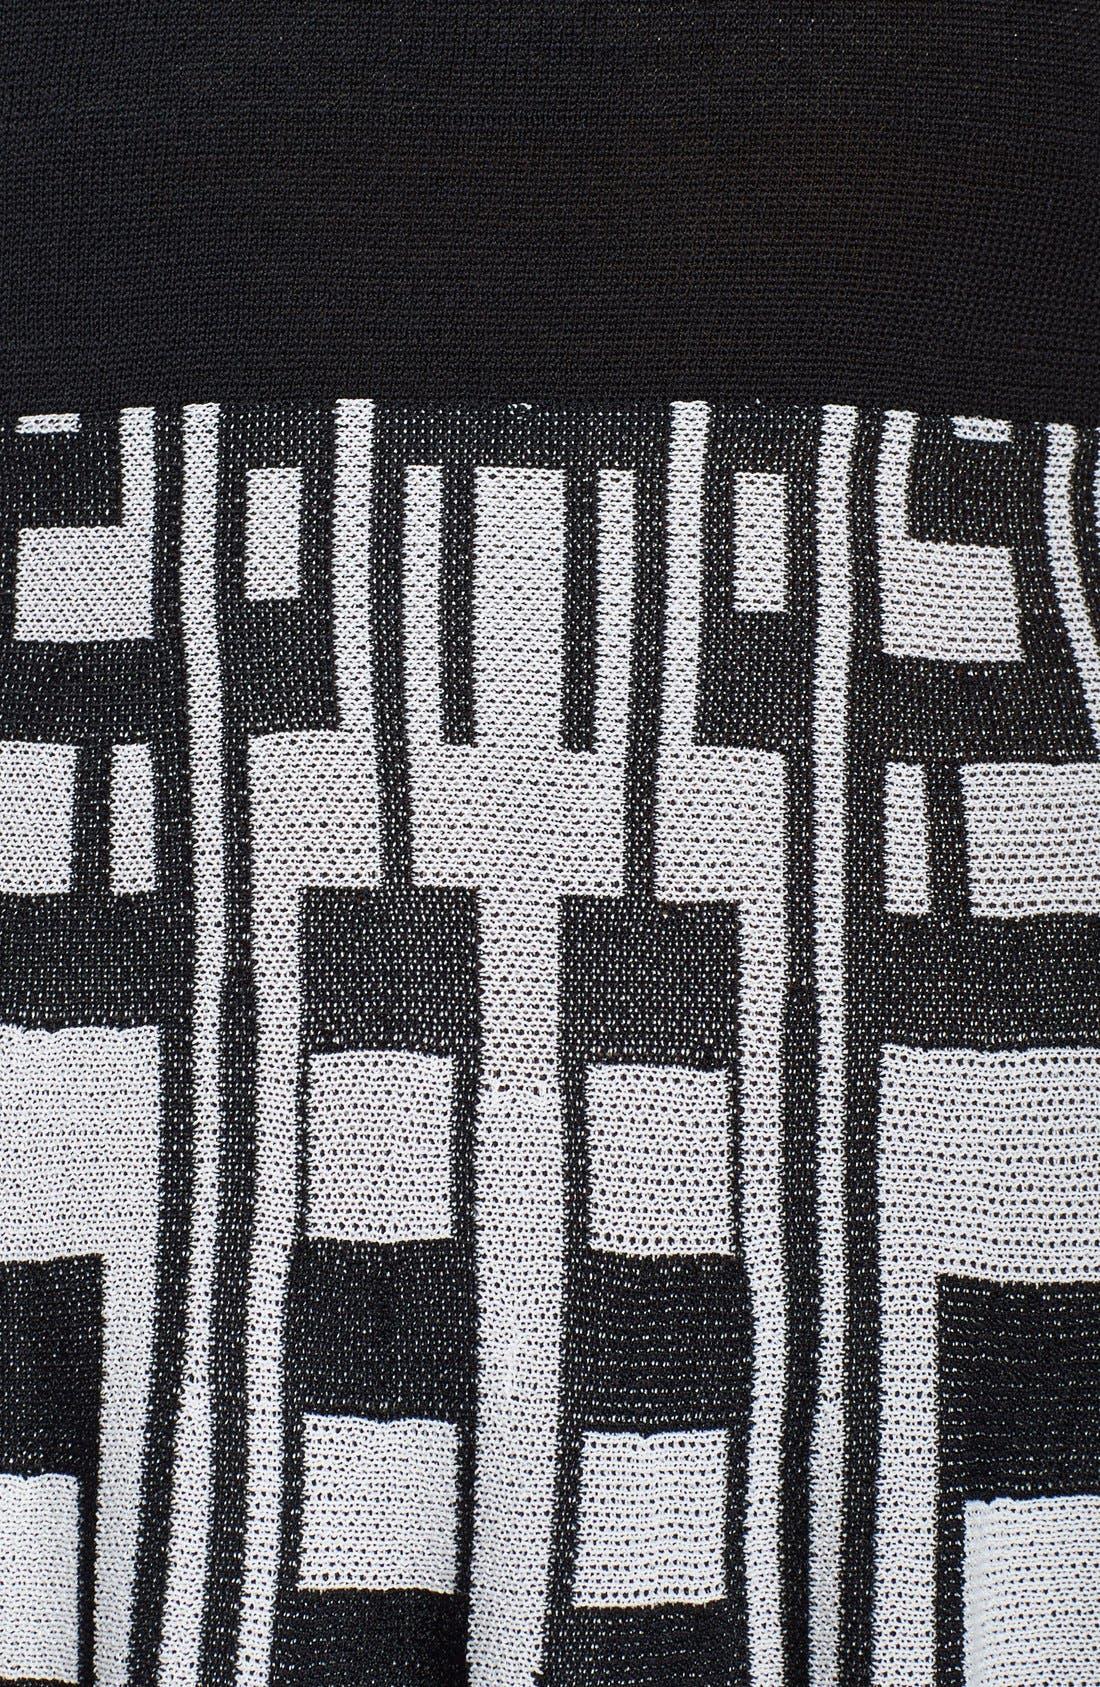 Alternate Image 4  - Plenty by Tracy Reese 'Amber' Print Skirt Fit & Flare Sweater Dress (Regular & Petite)